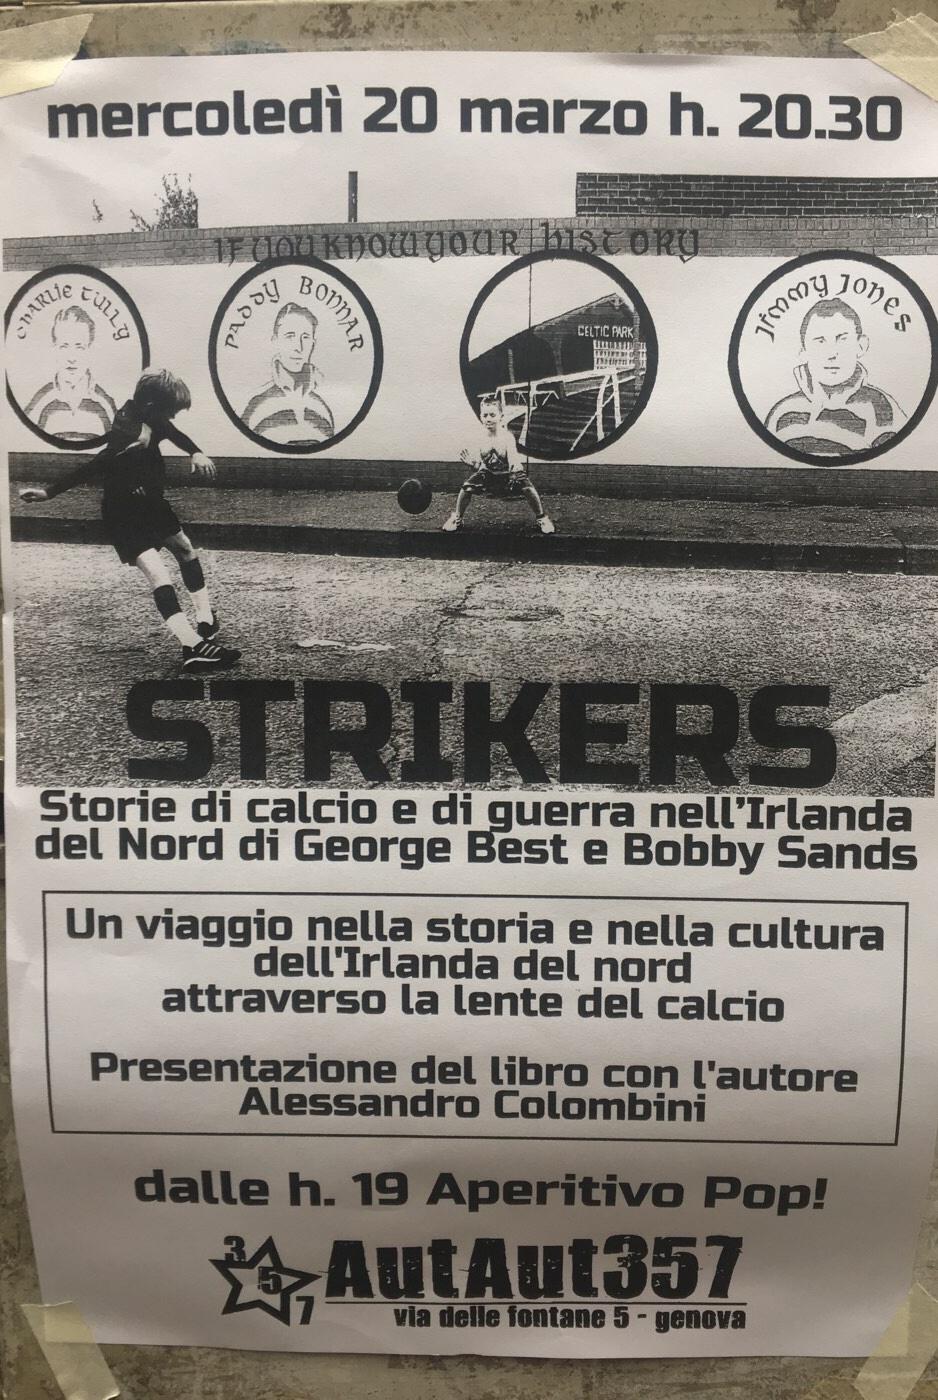 Strikers AutAut357 Via delle Fontane 5, 16123 Genova Dal 20/03/2019 Al 20/03/2019 19:00 - 22:00